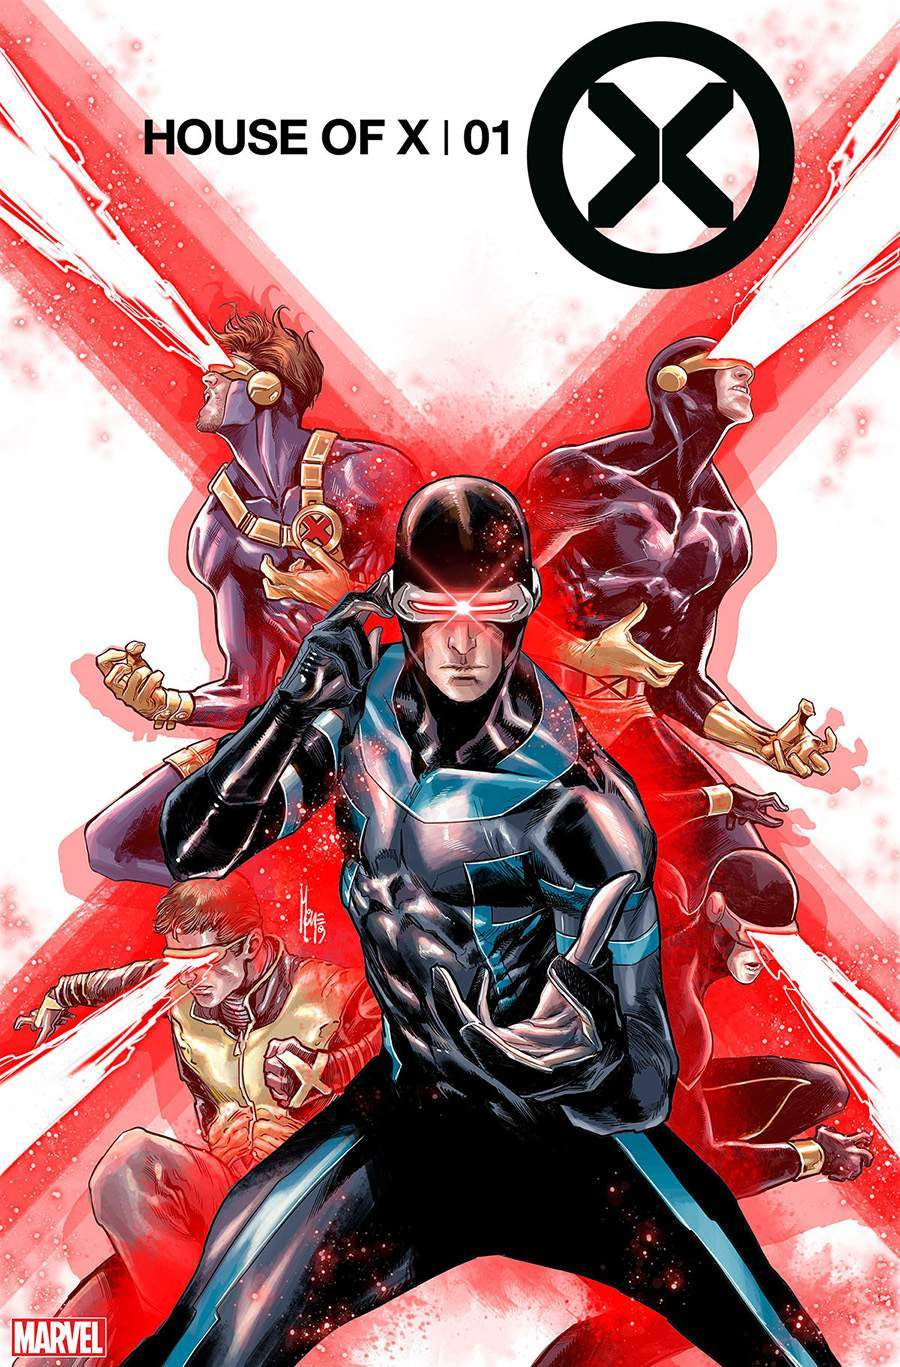 House-of-X-Cyclops-Marco-Checchetto-Cover